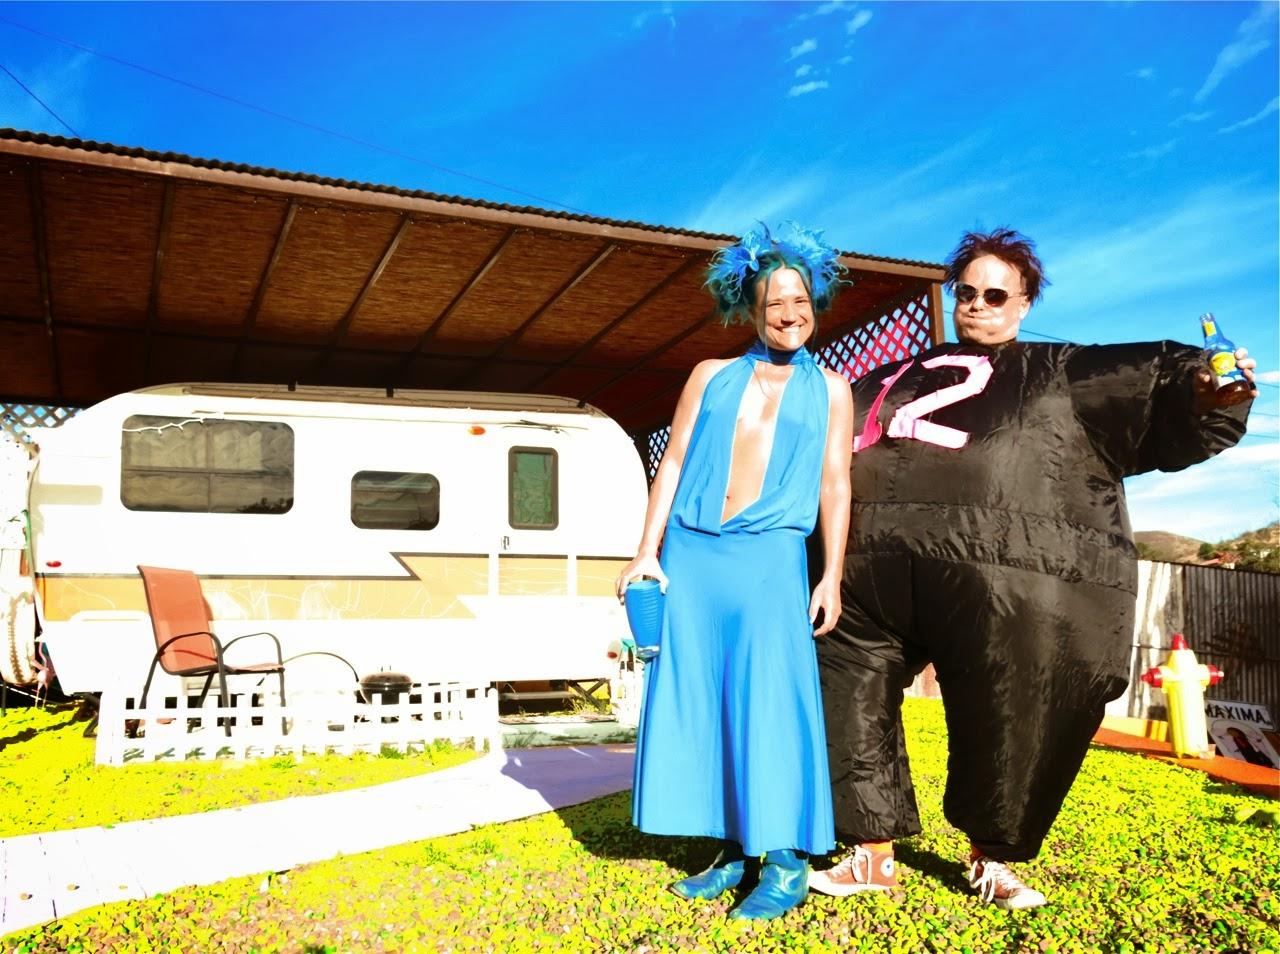 PAINTRESS GRETCHEN: Doug Stanhope Superbowl Celebration 2014